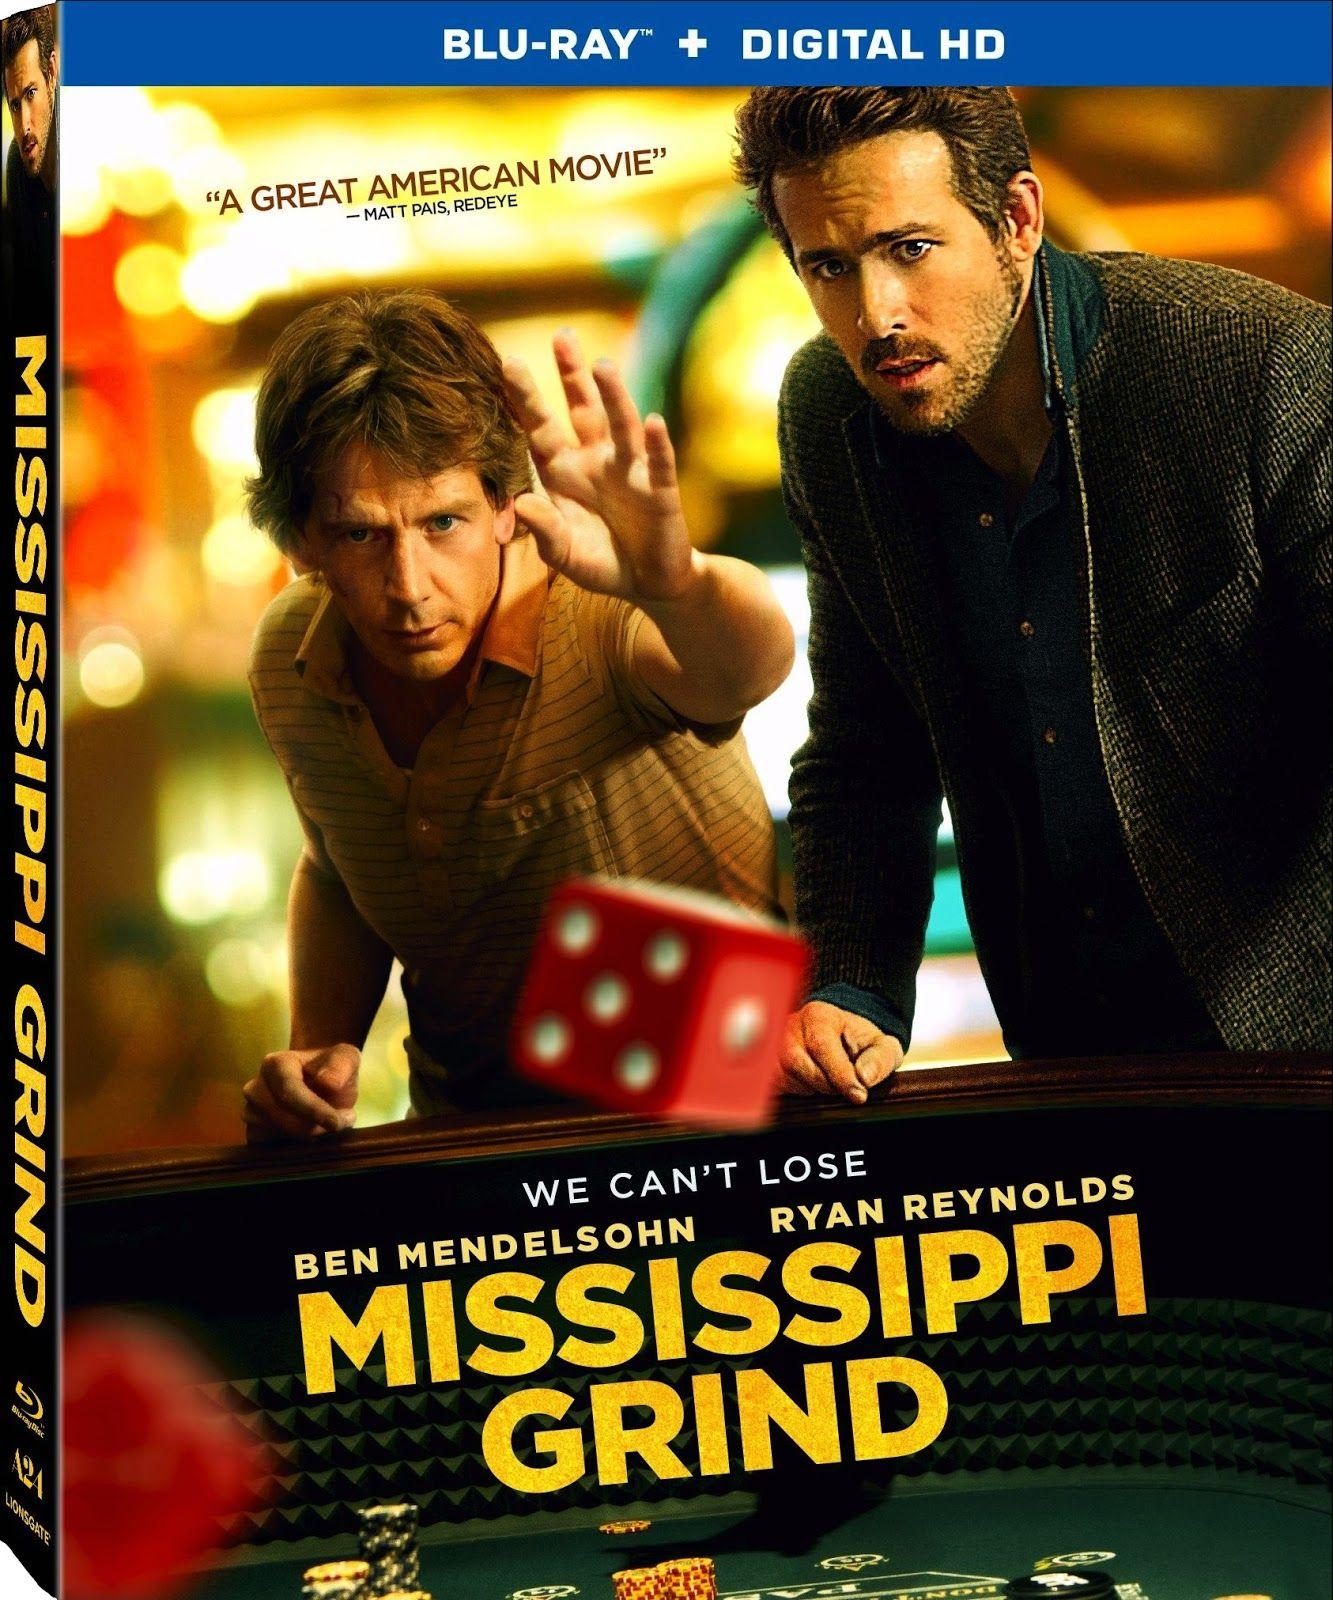 DVD & BluRay MISSISSIPPI GRIND (2015) Ryan reynolds